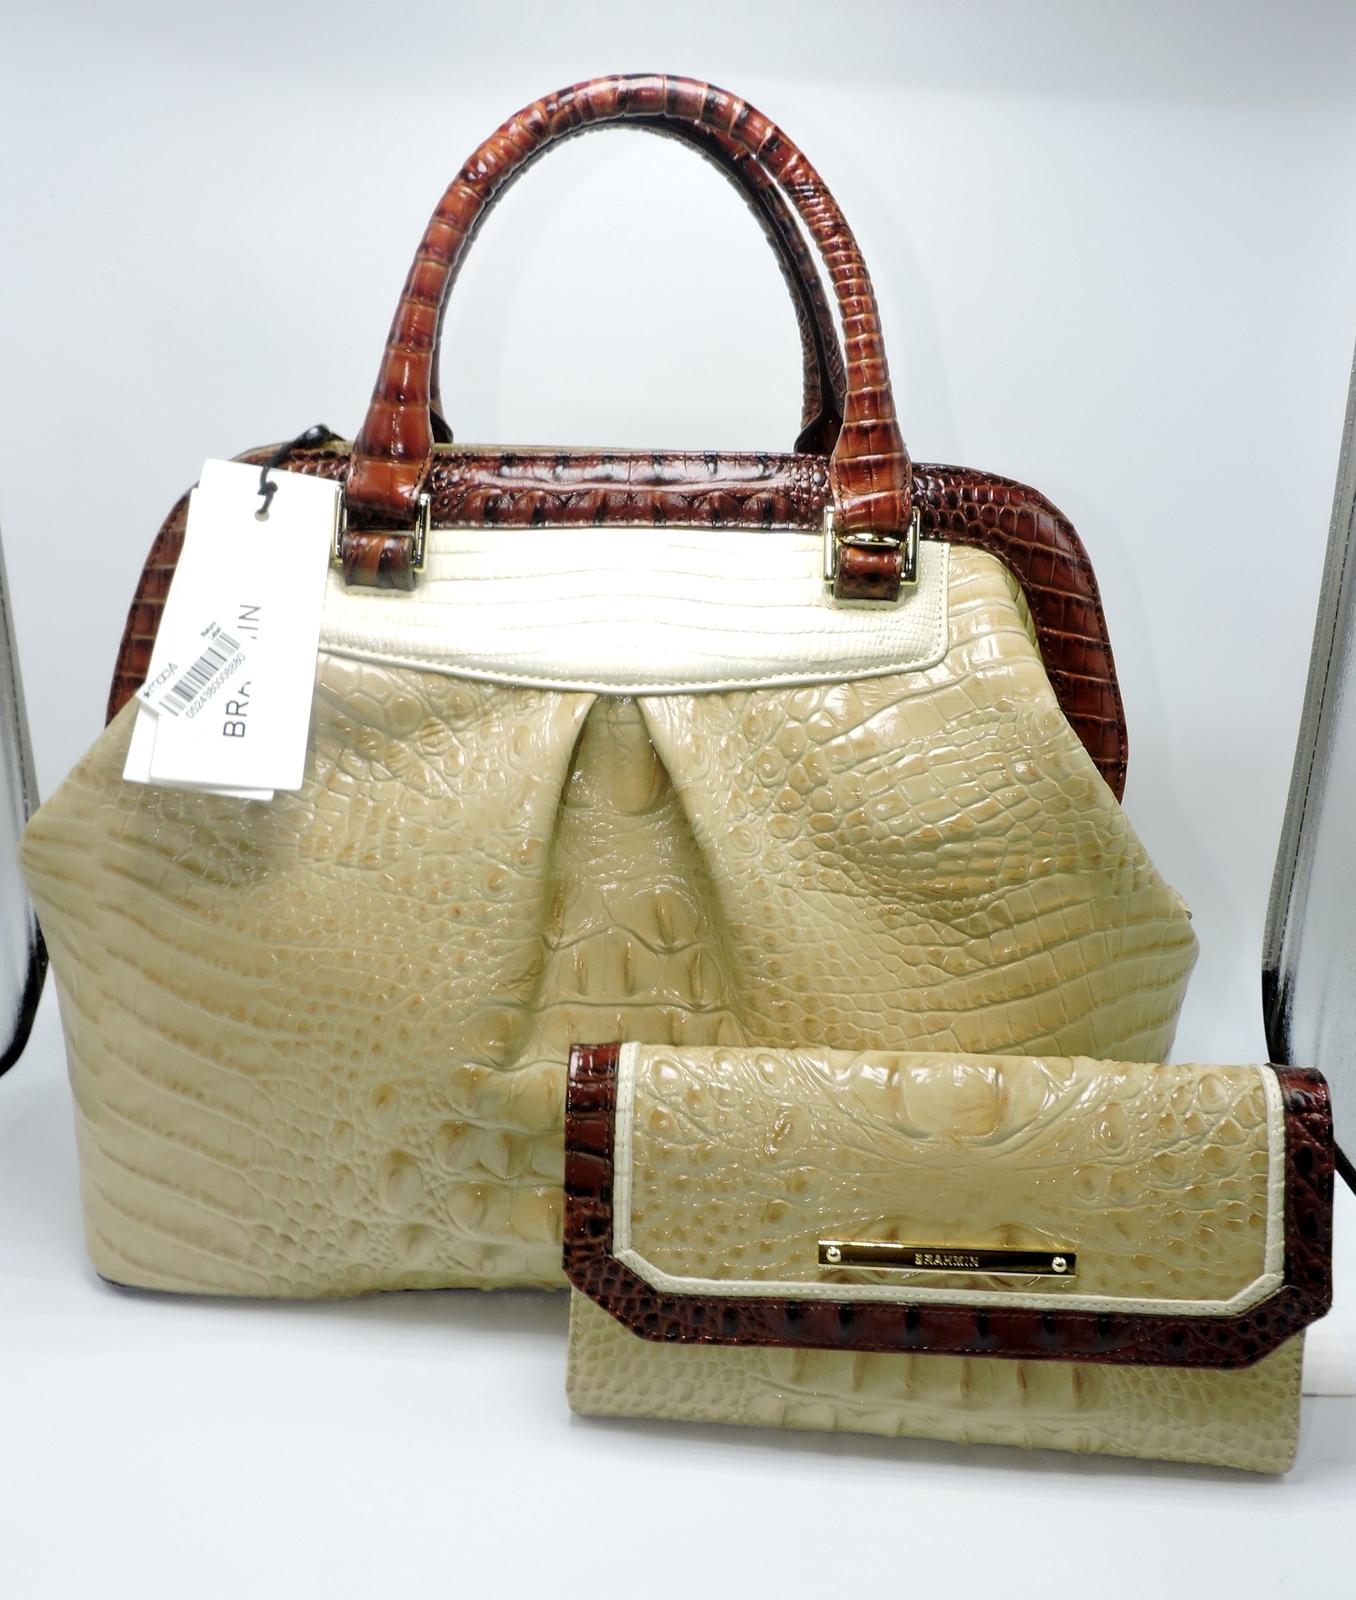 0a69bc1e32 Dscn5052. Dscn5052. Brahmin Bristol Twill TriColor Pecan Tan Cream Leather  Satchel Checkbook Wallet ...